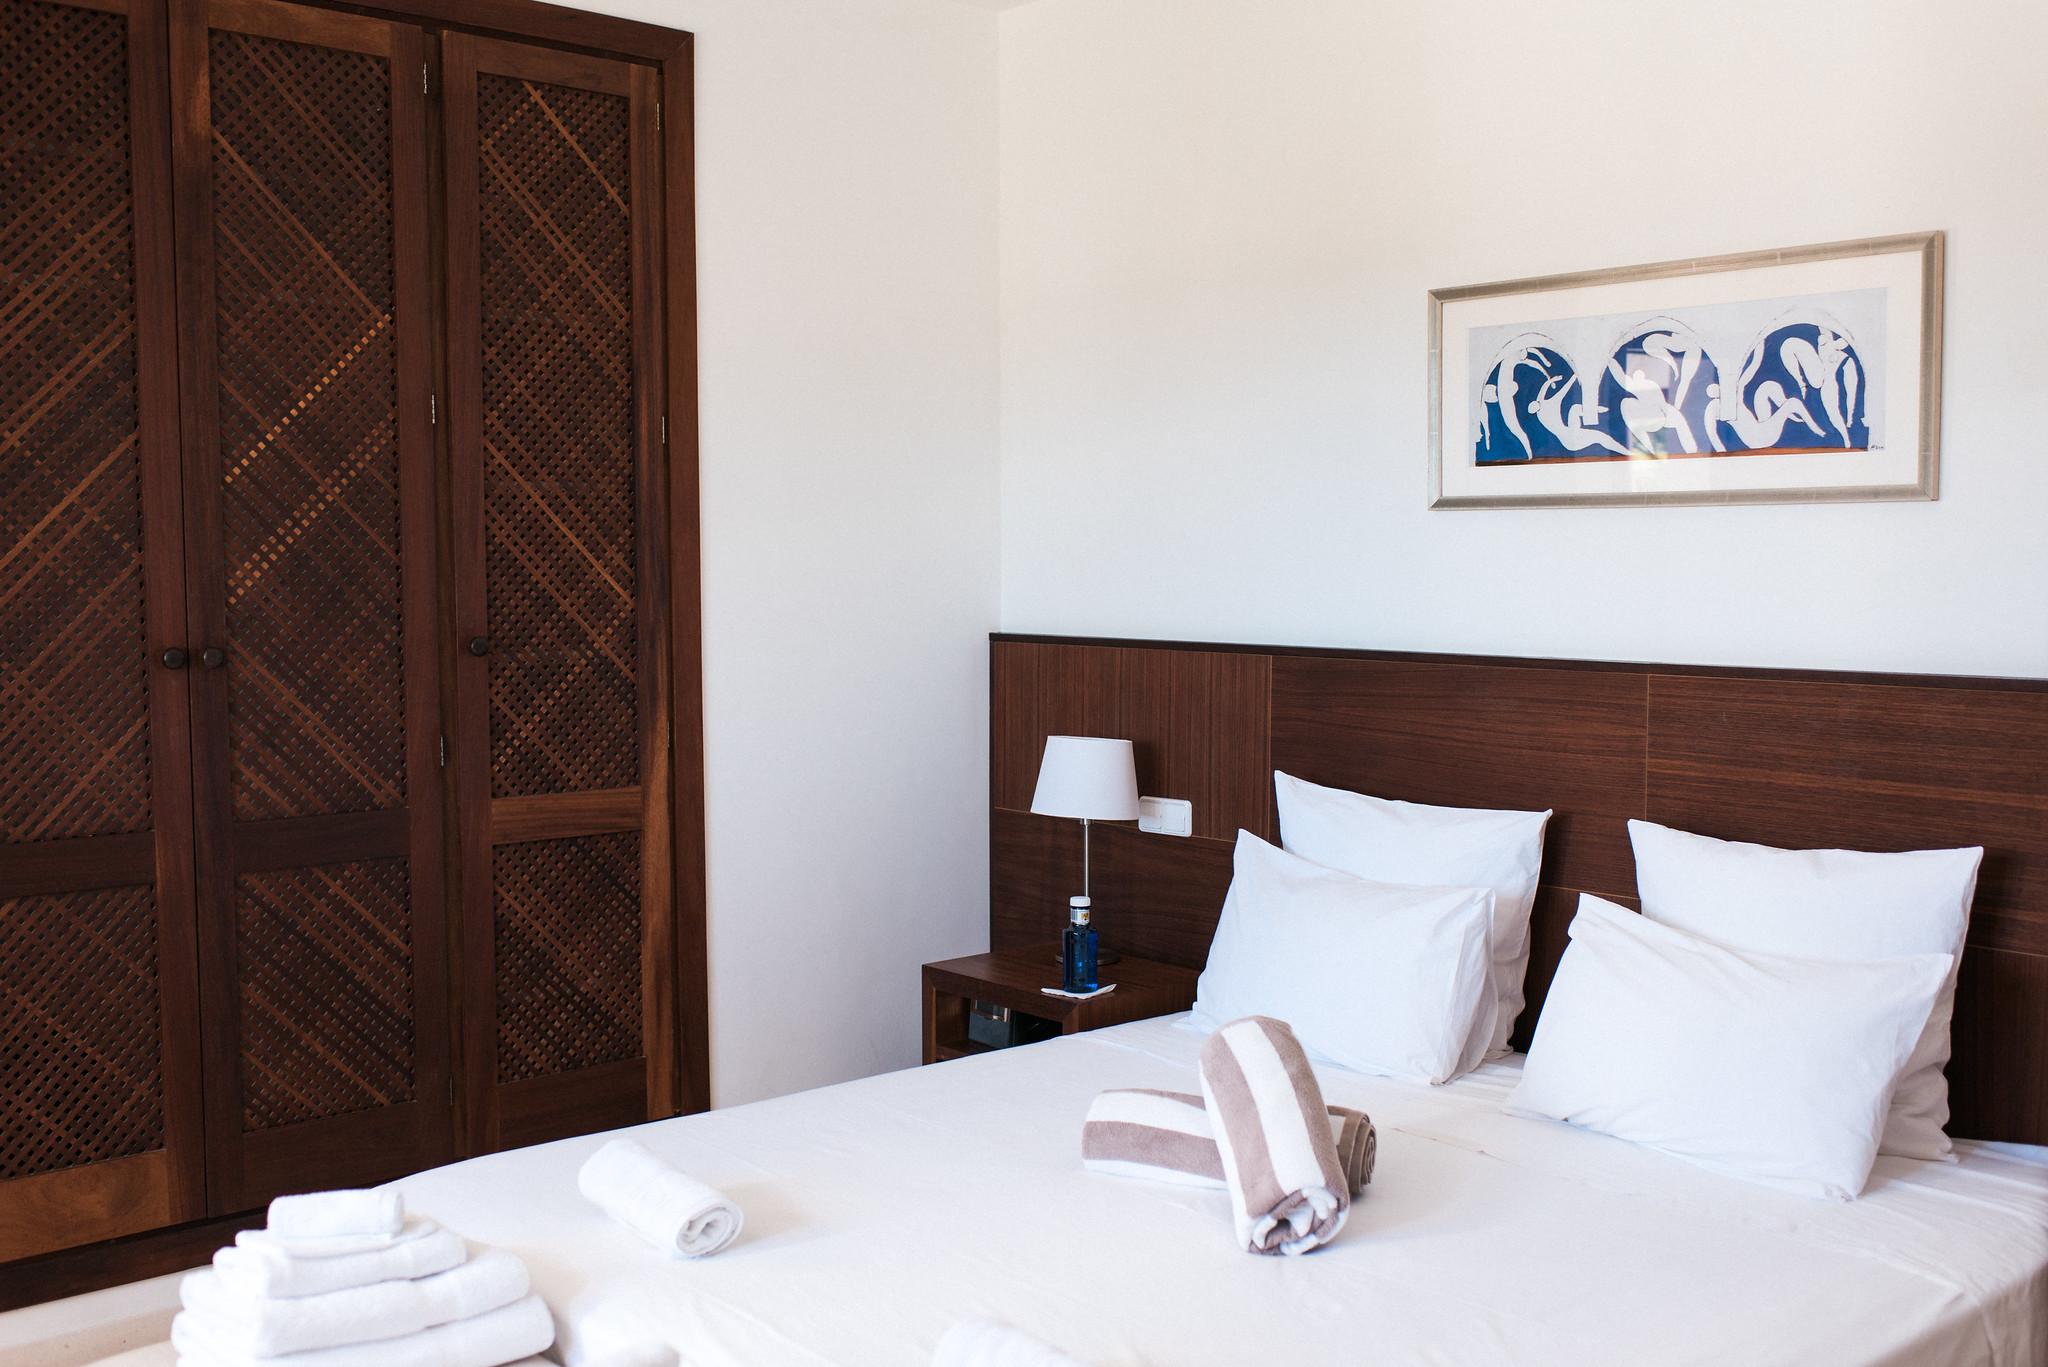 https://www.white-ibiza.com/wp-content/uploads/2020/05/white-ibiza-villas-can-ava-bedroom2.jpg